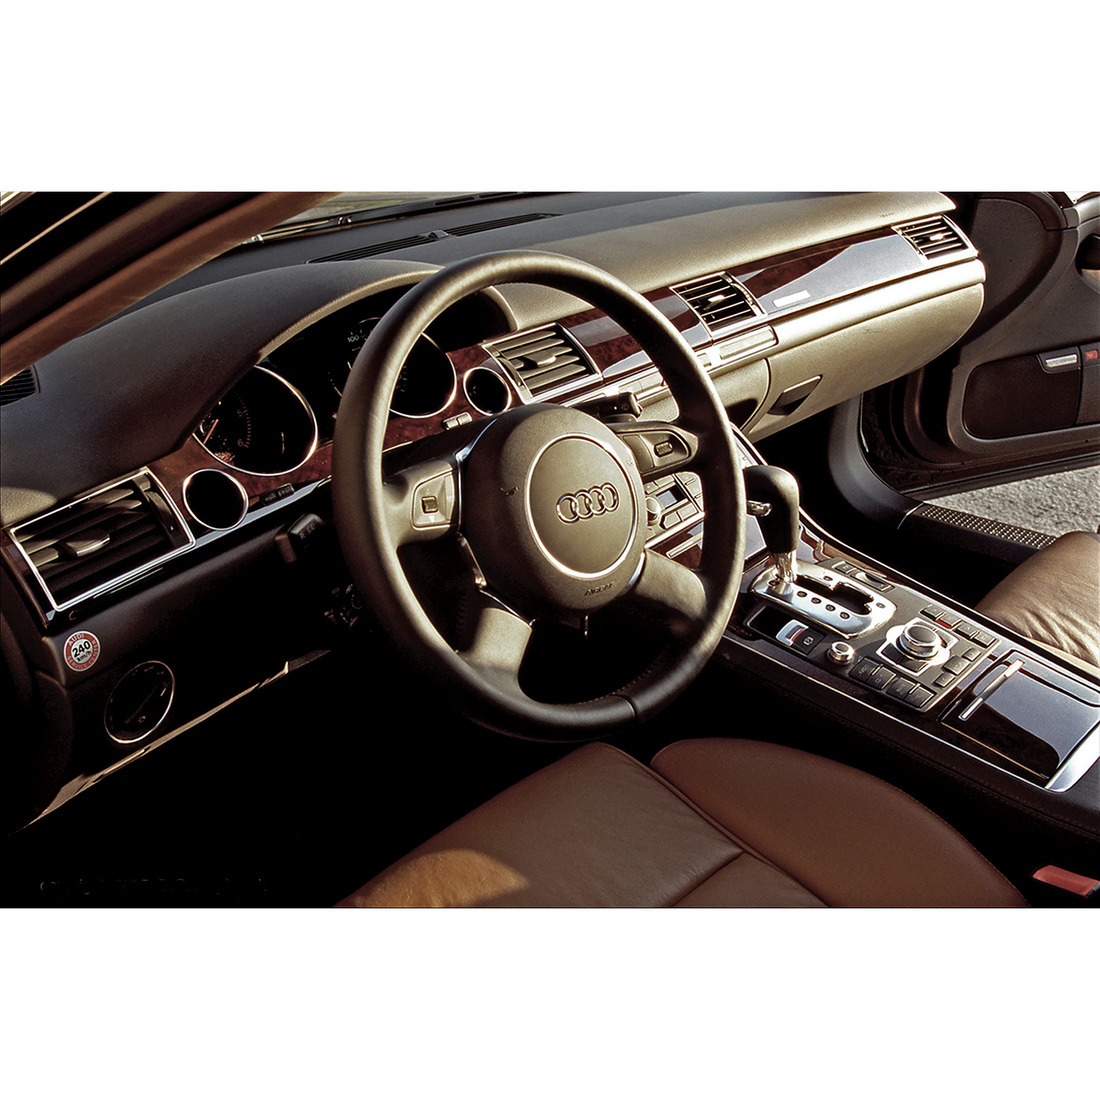 LT_20_Audi_1100x